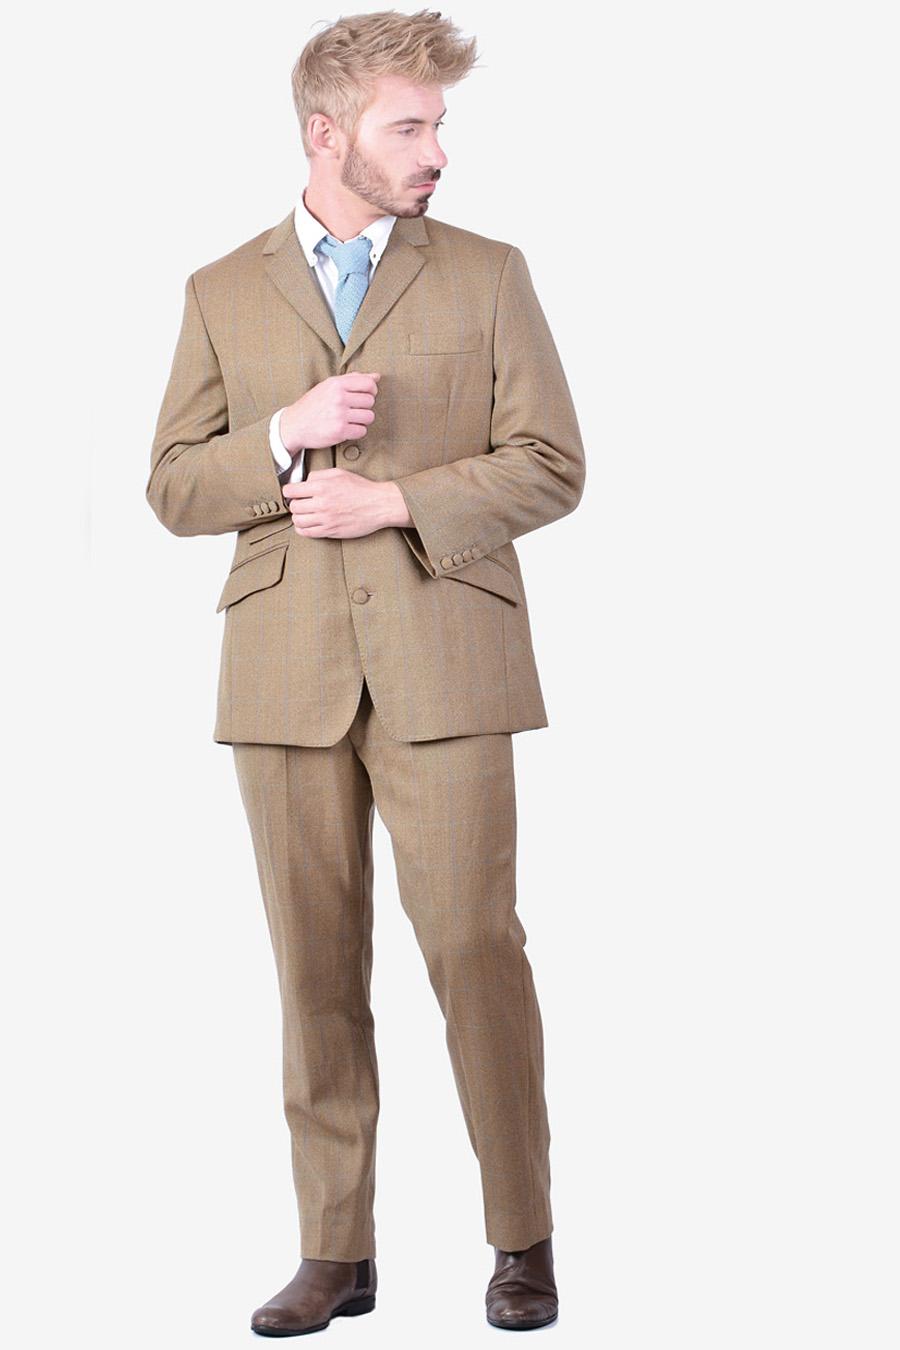 Vintage Barney Goodman suit